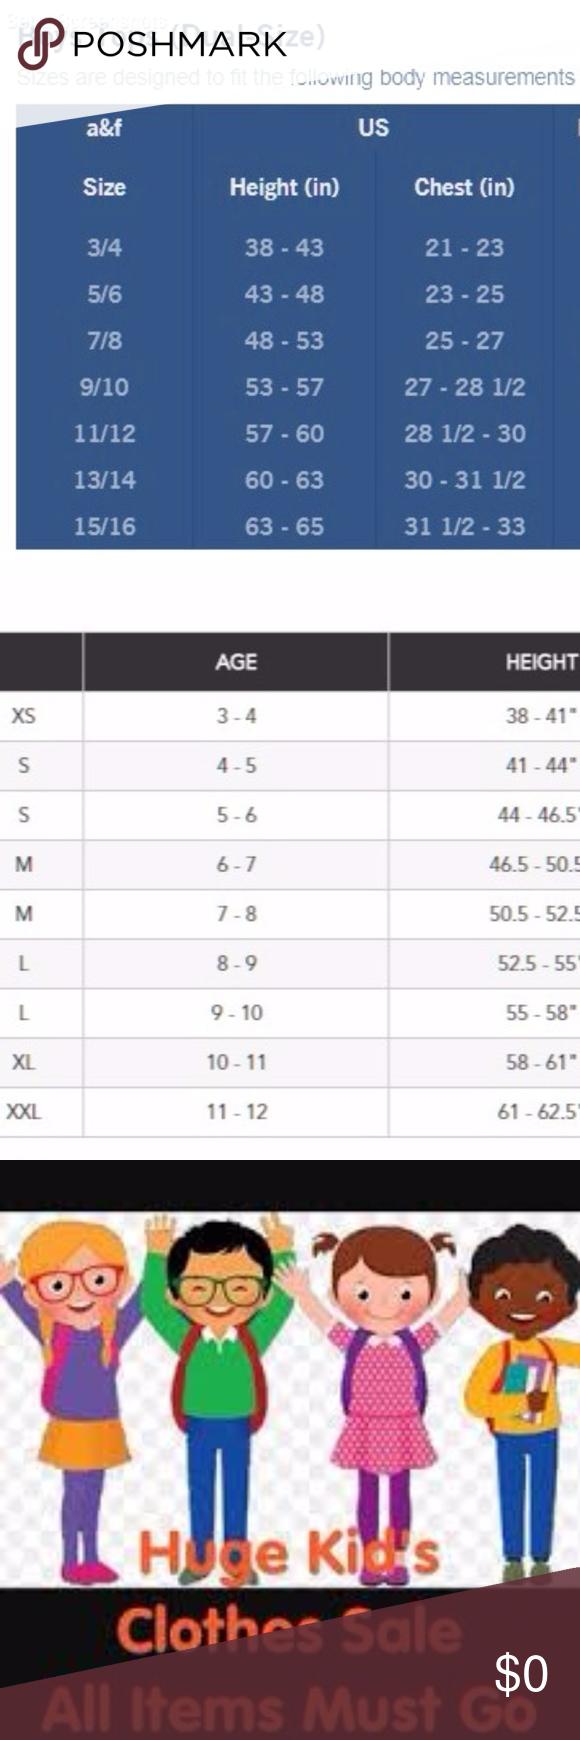 Abercrombie Kids Size Chart : abercrombie, chart, Abercrombie, Children's, Place, Charts, Chart, These, Pretty…, Kids,, Childrens, Place,